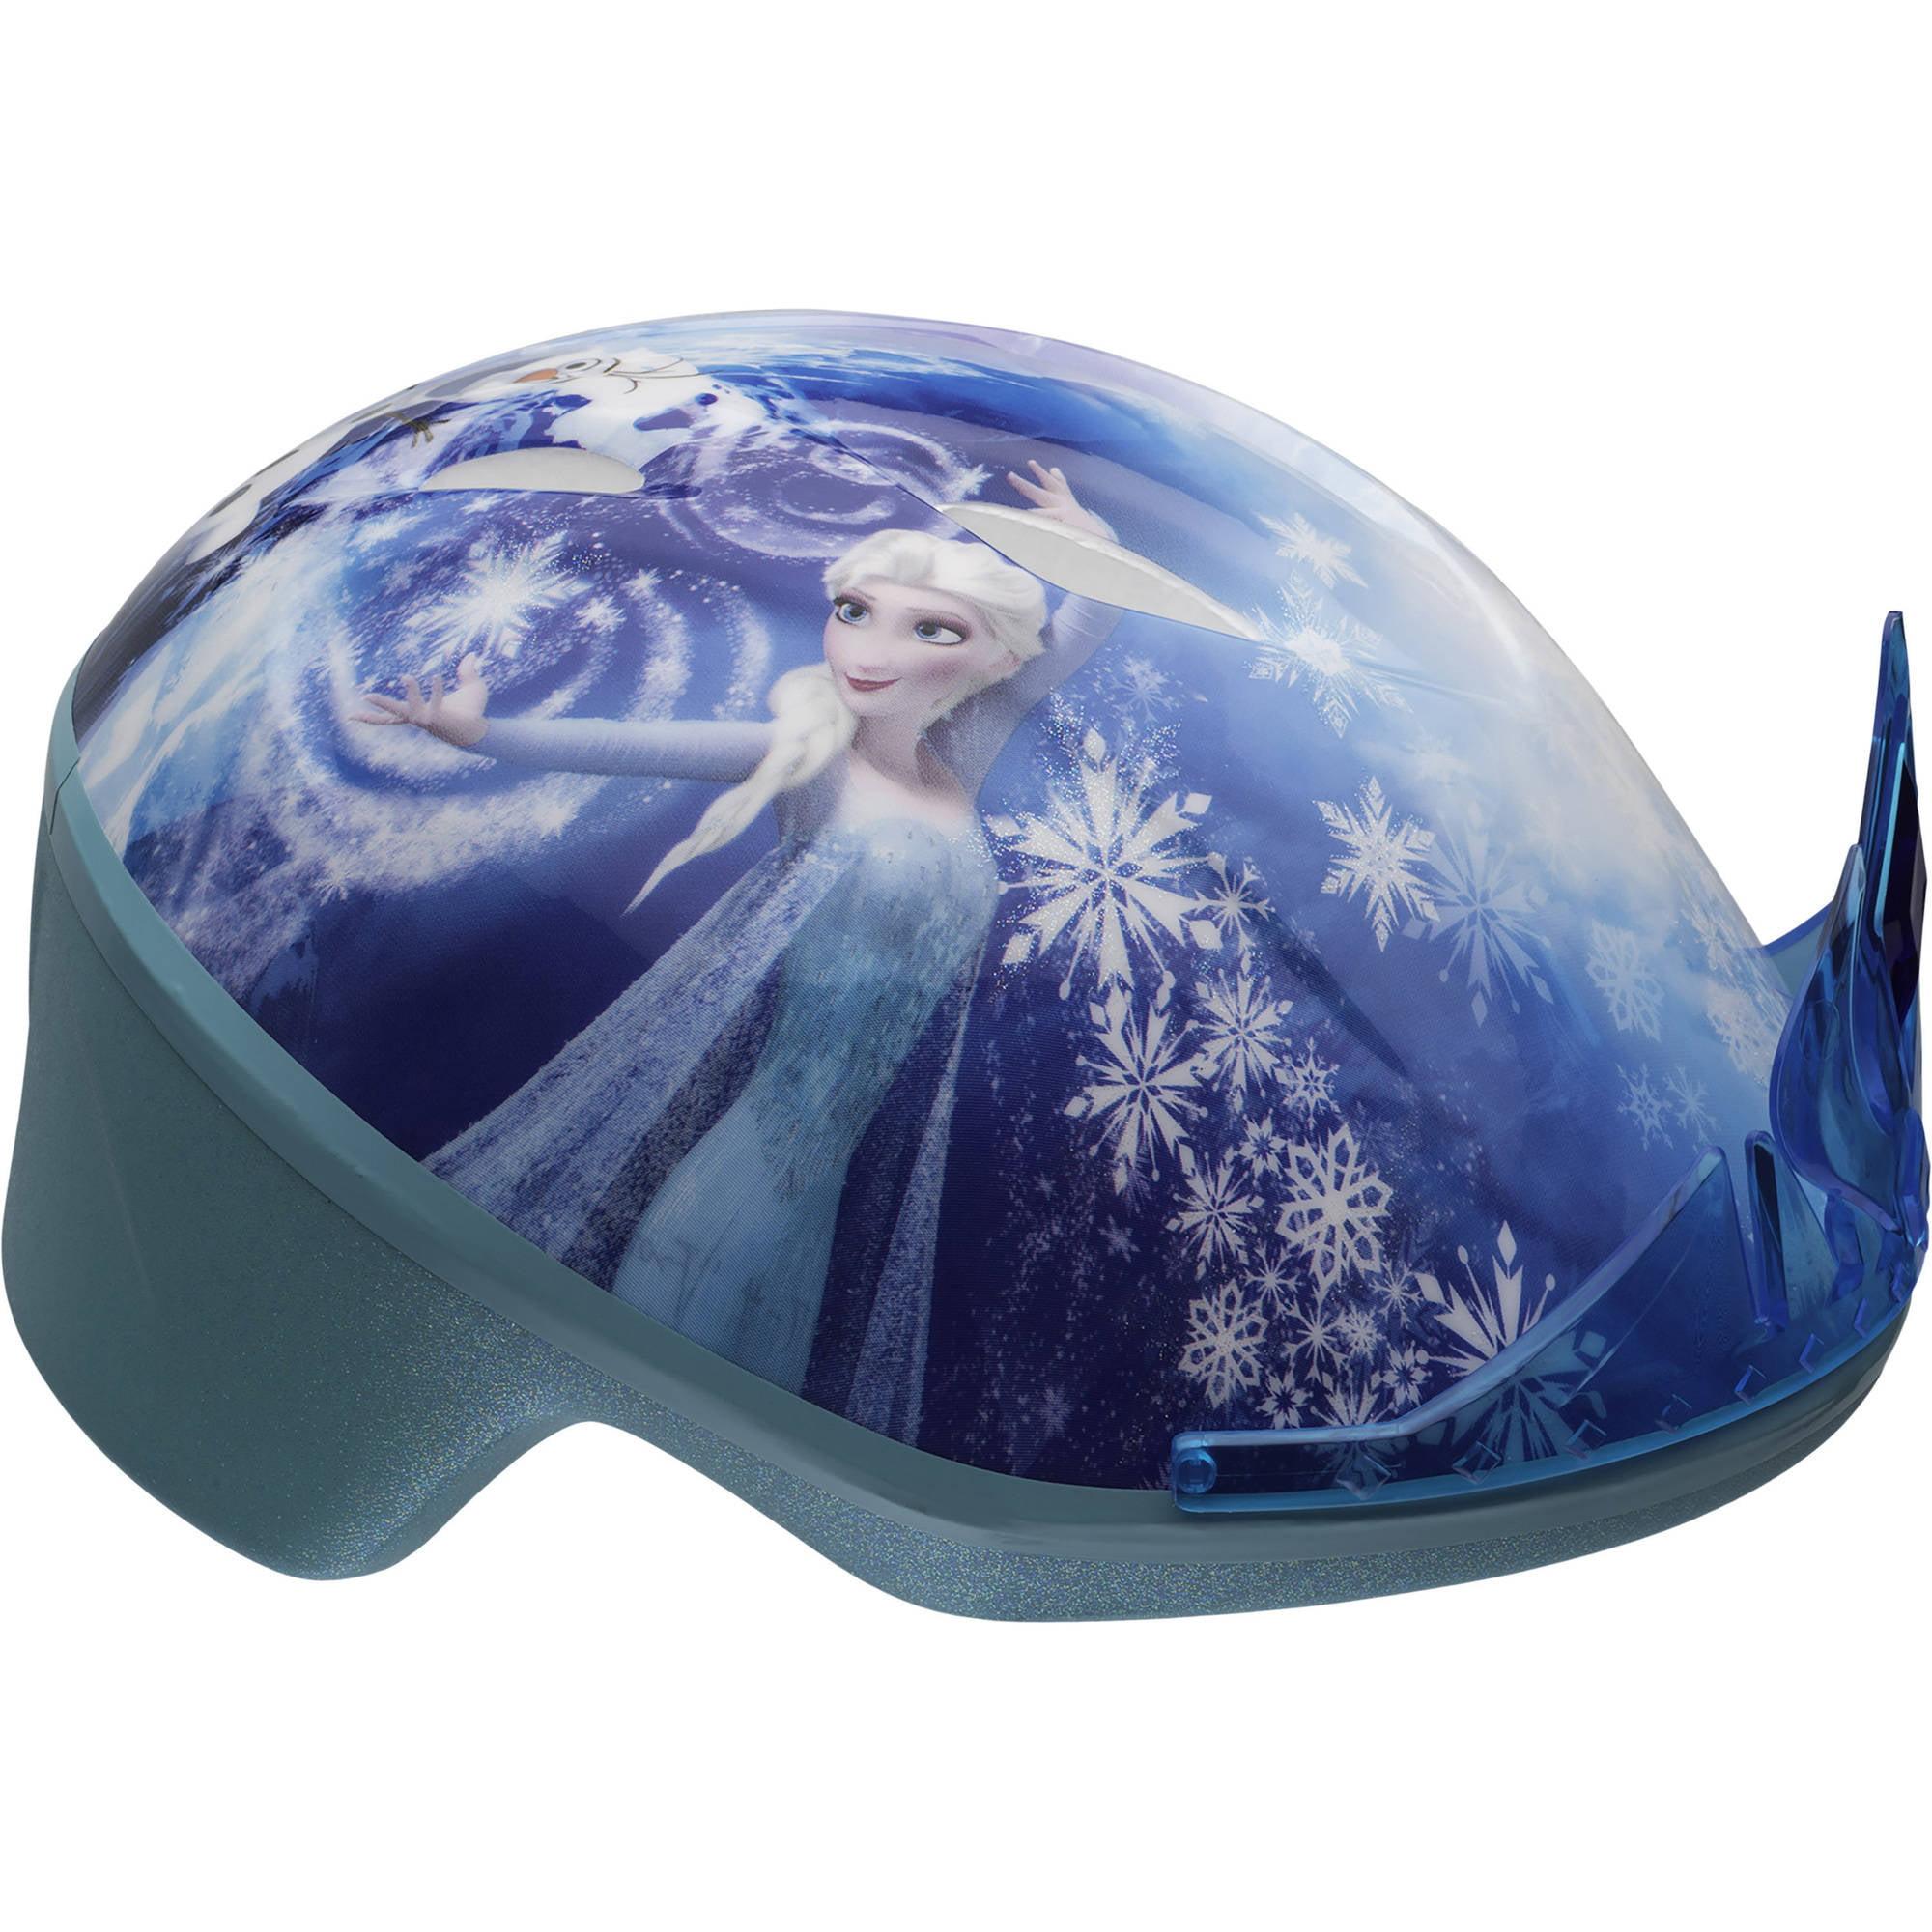 Bell 7068215 Disney Frozen 3D Tiara Toddler Bike Helmet, Blue by Vista Outdoor